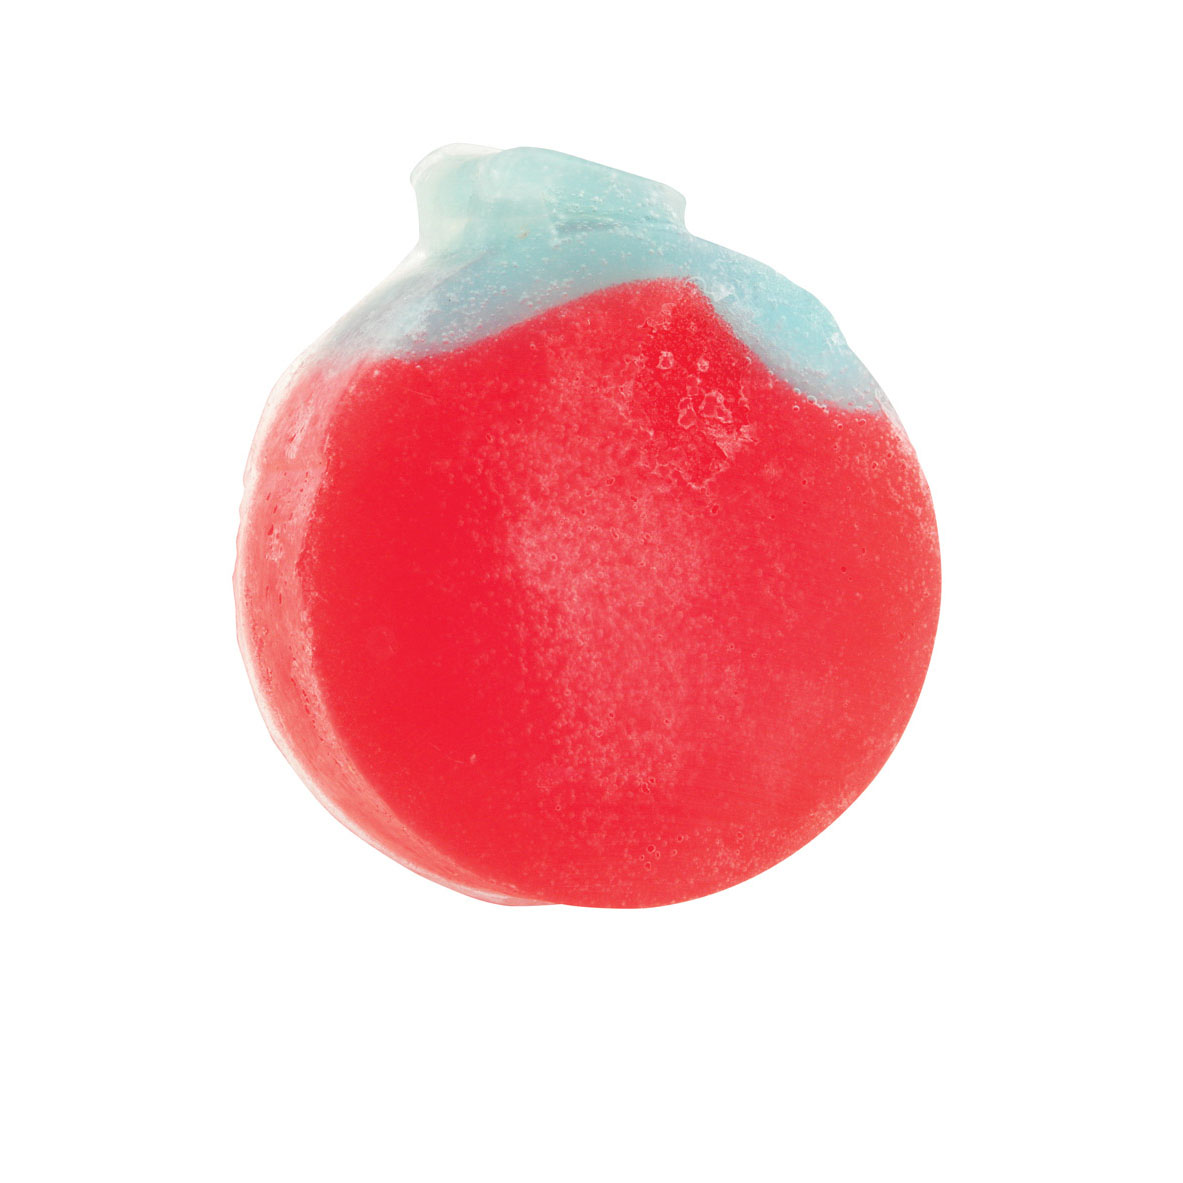 SPS006 Peruvian Cherry Soap Sponge